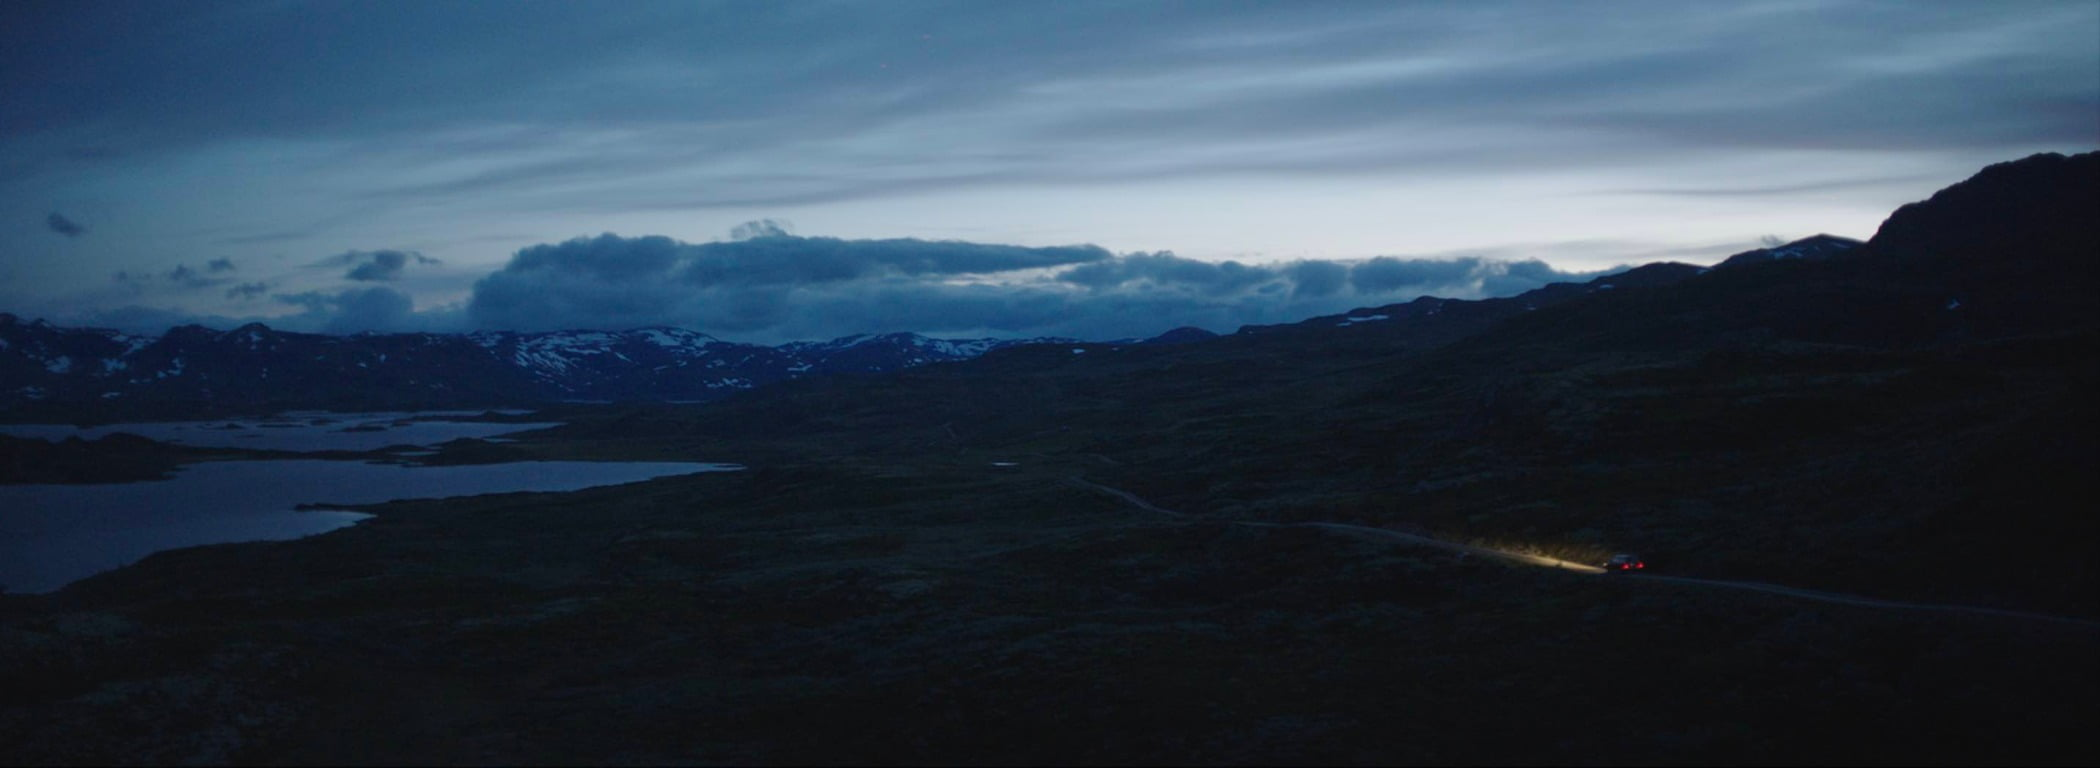 Natural landscape, Cloud, Sky, Mountain, Terrain